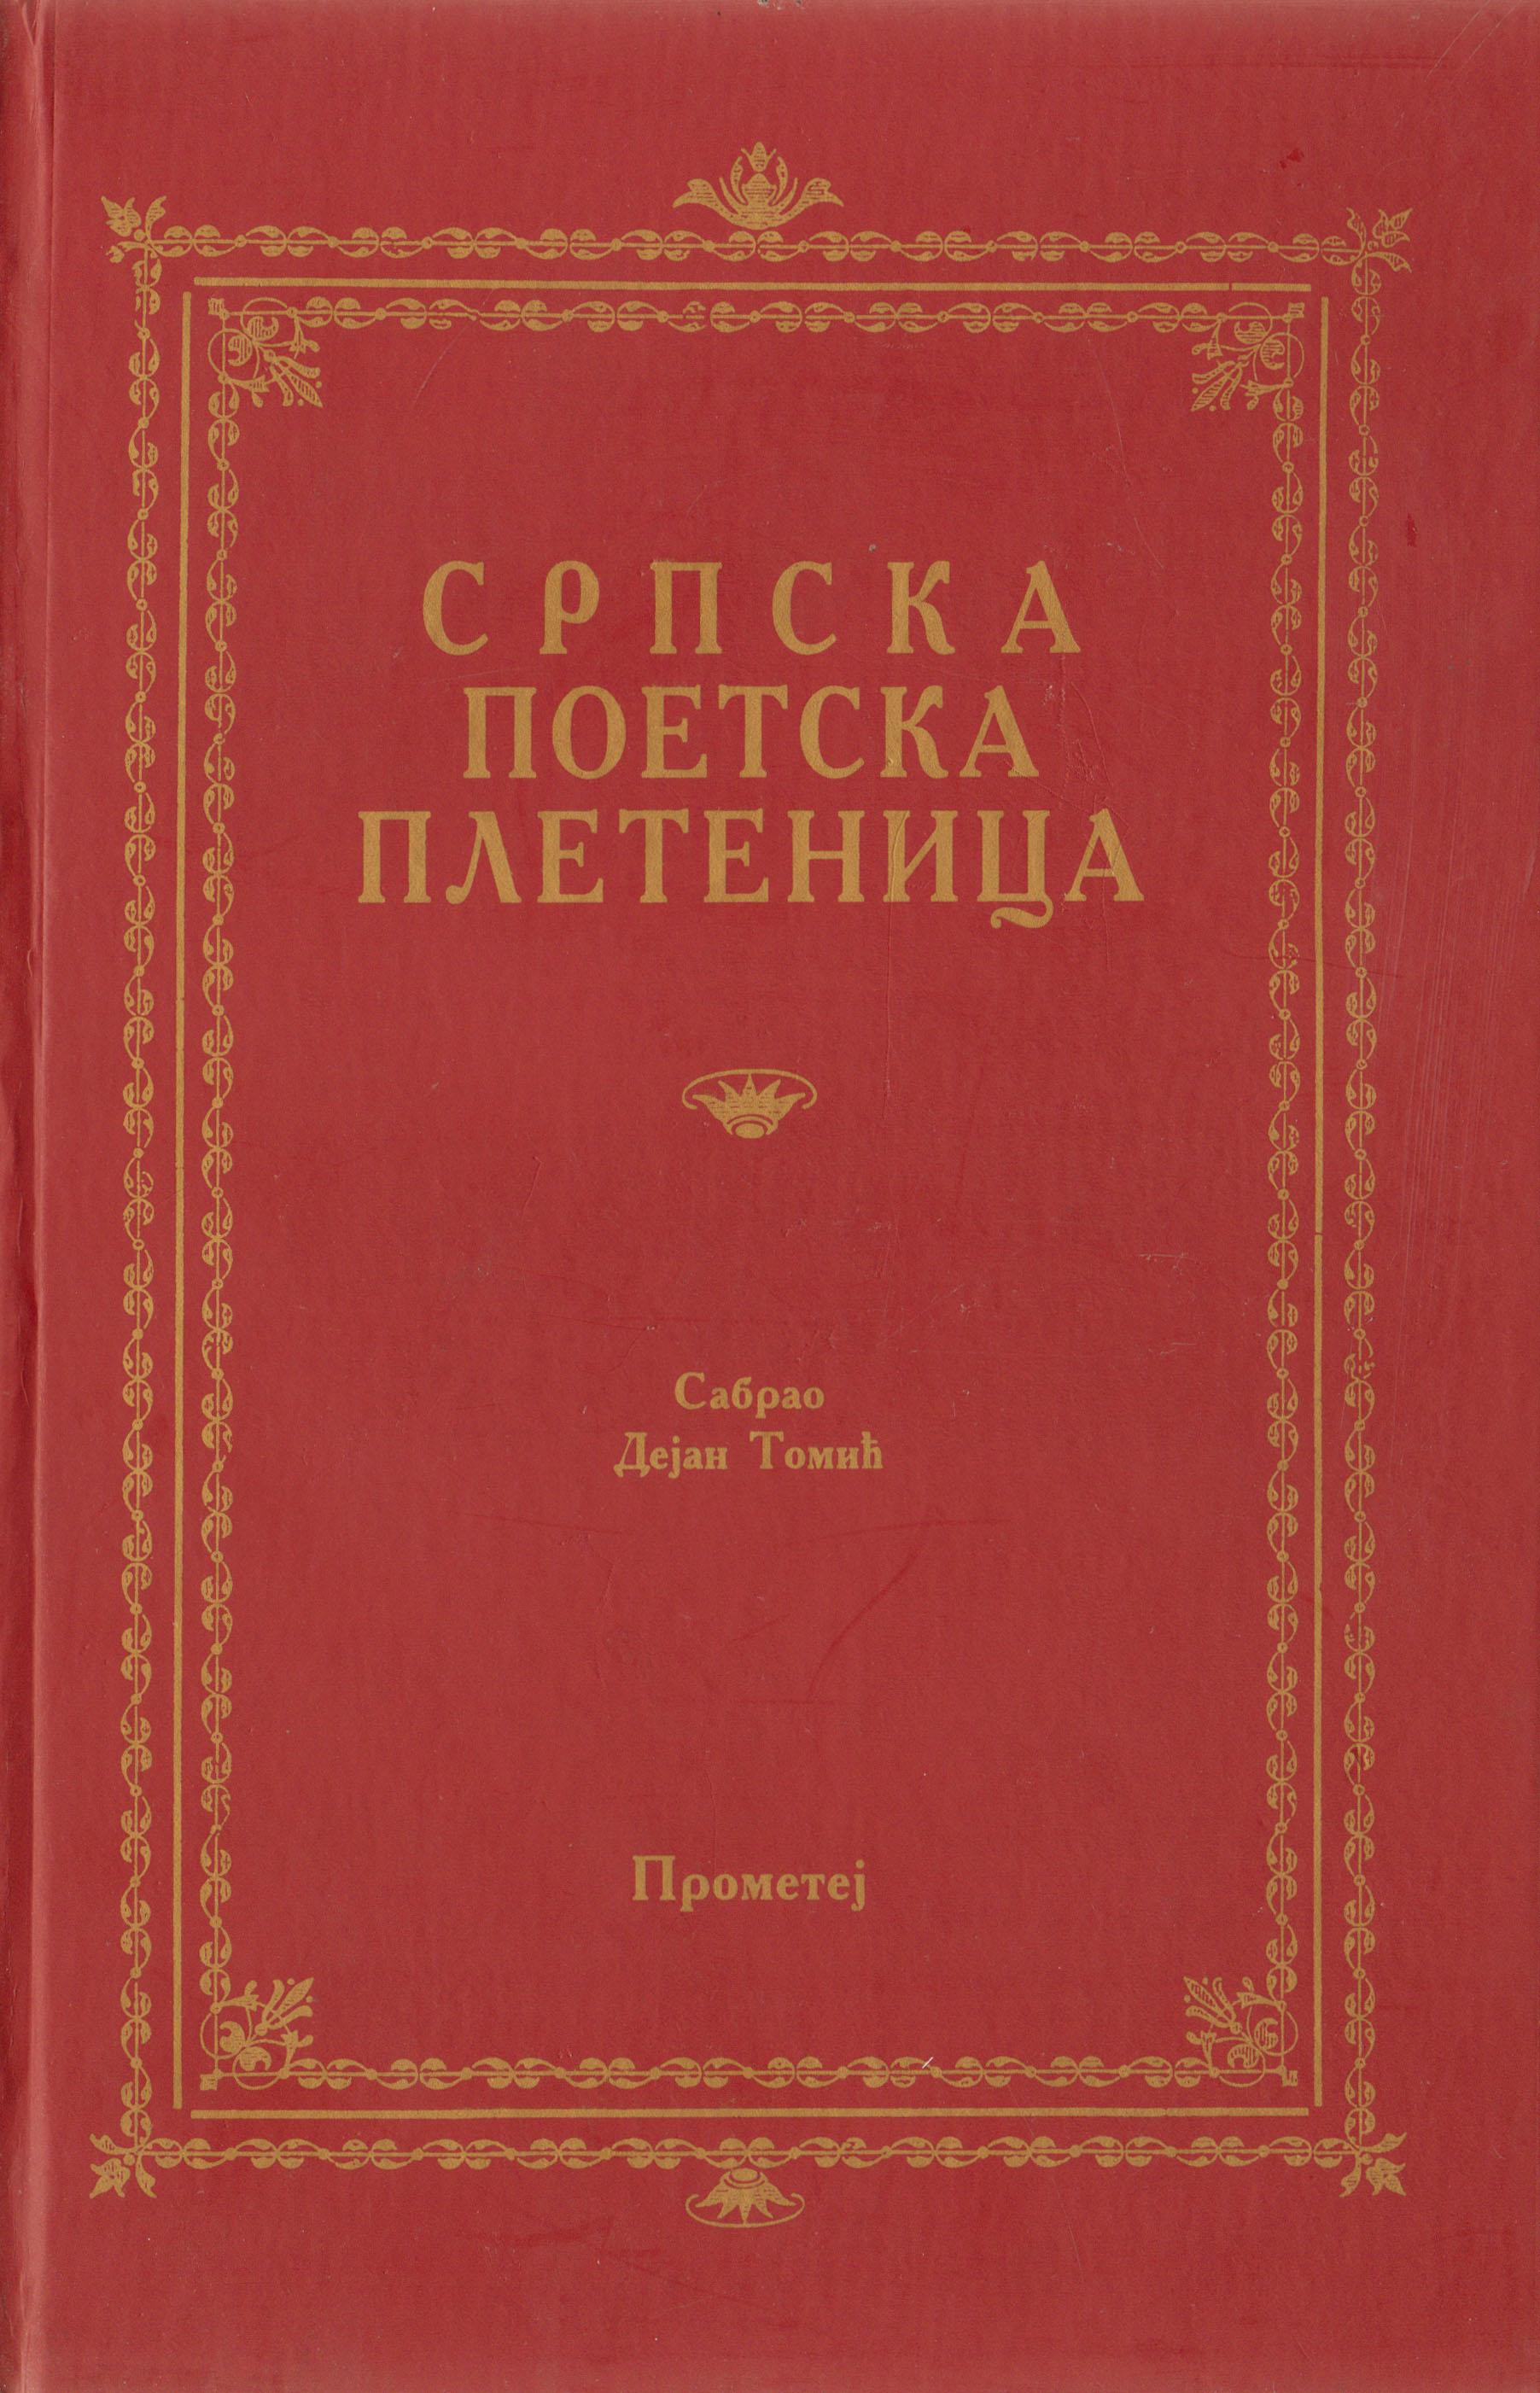 Српска поетска плетеница